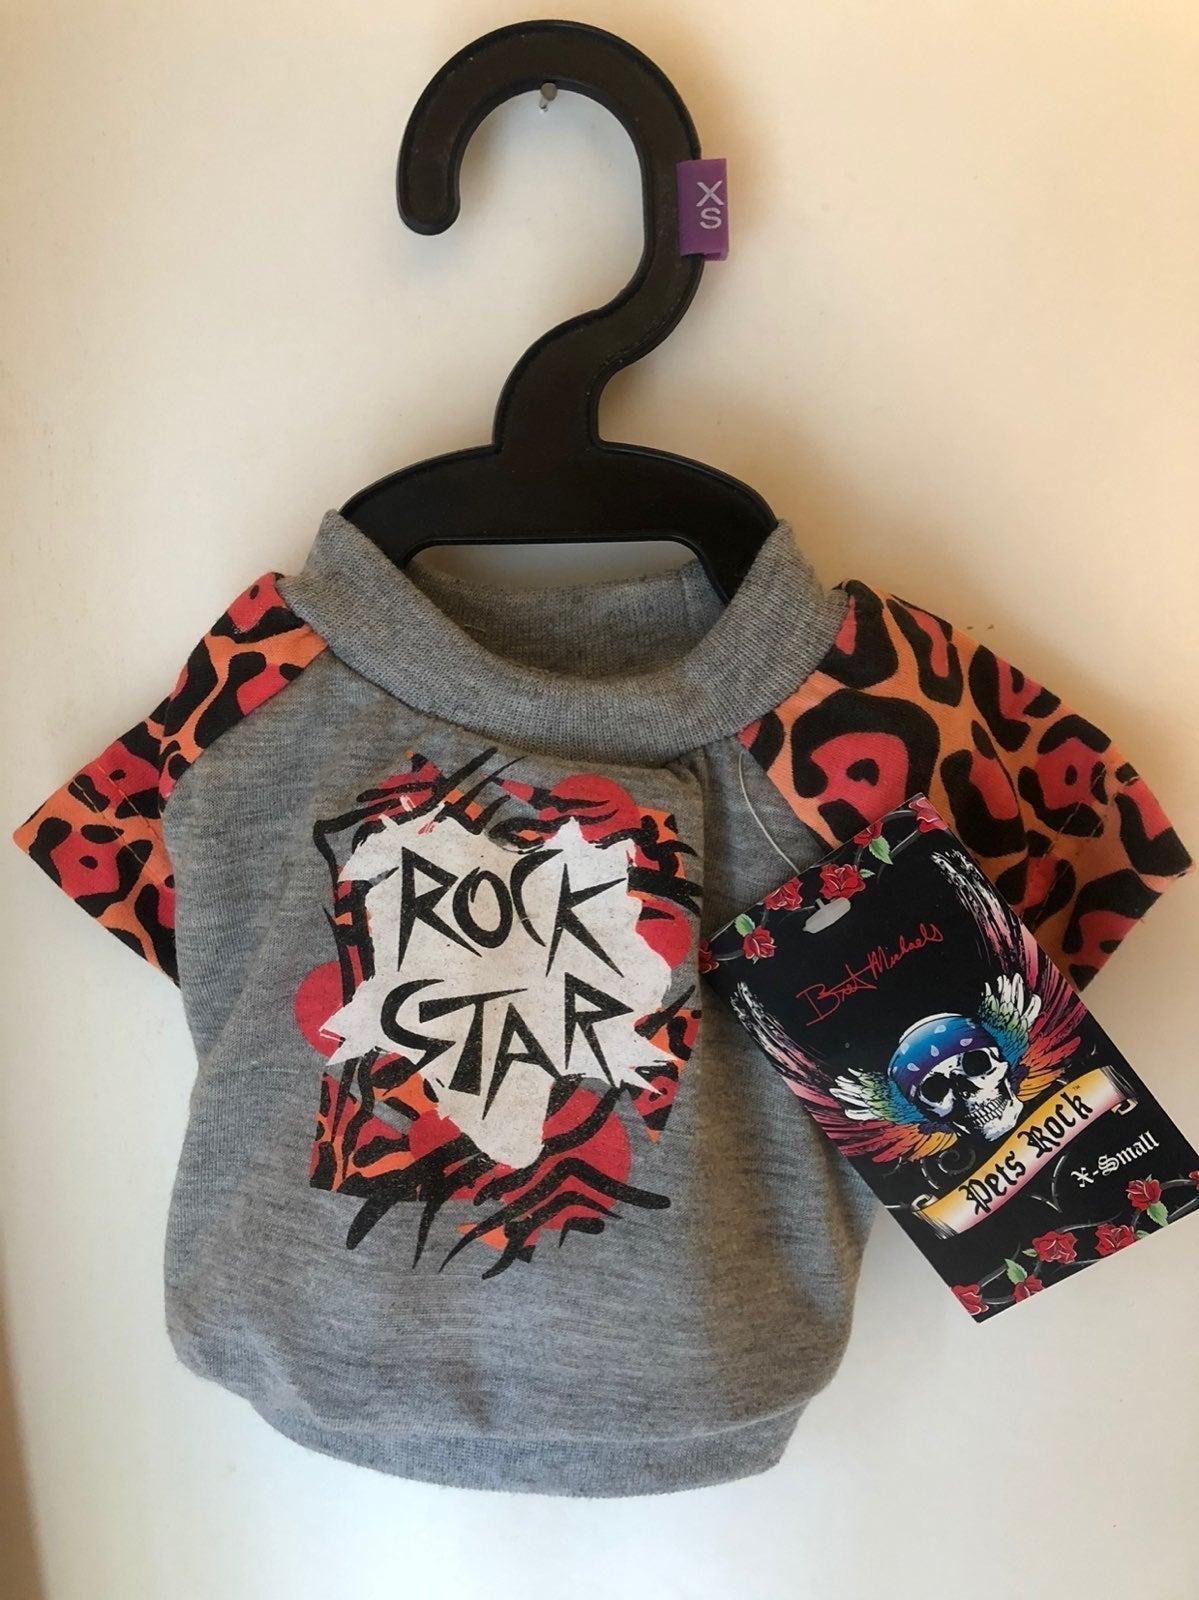 XS dog rock star shirt toy size